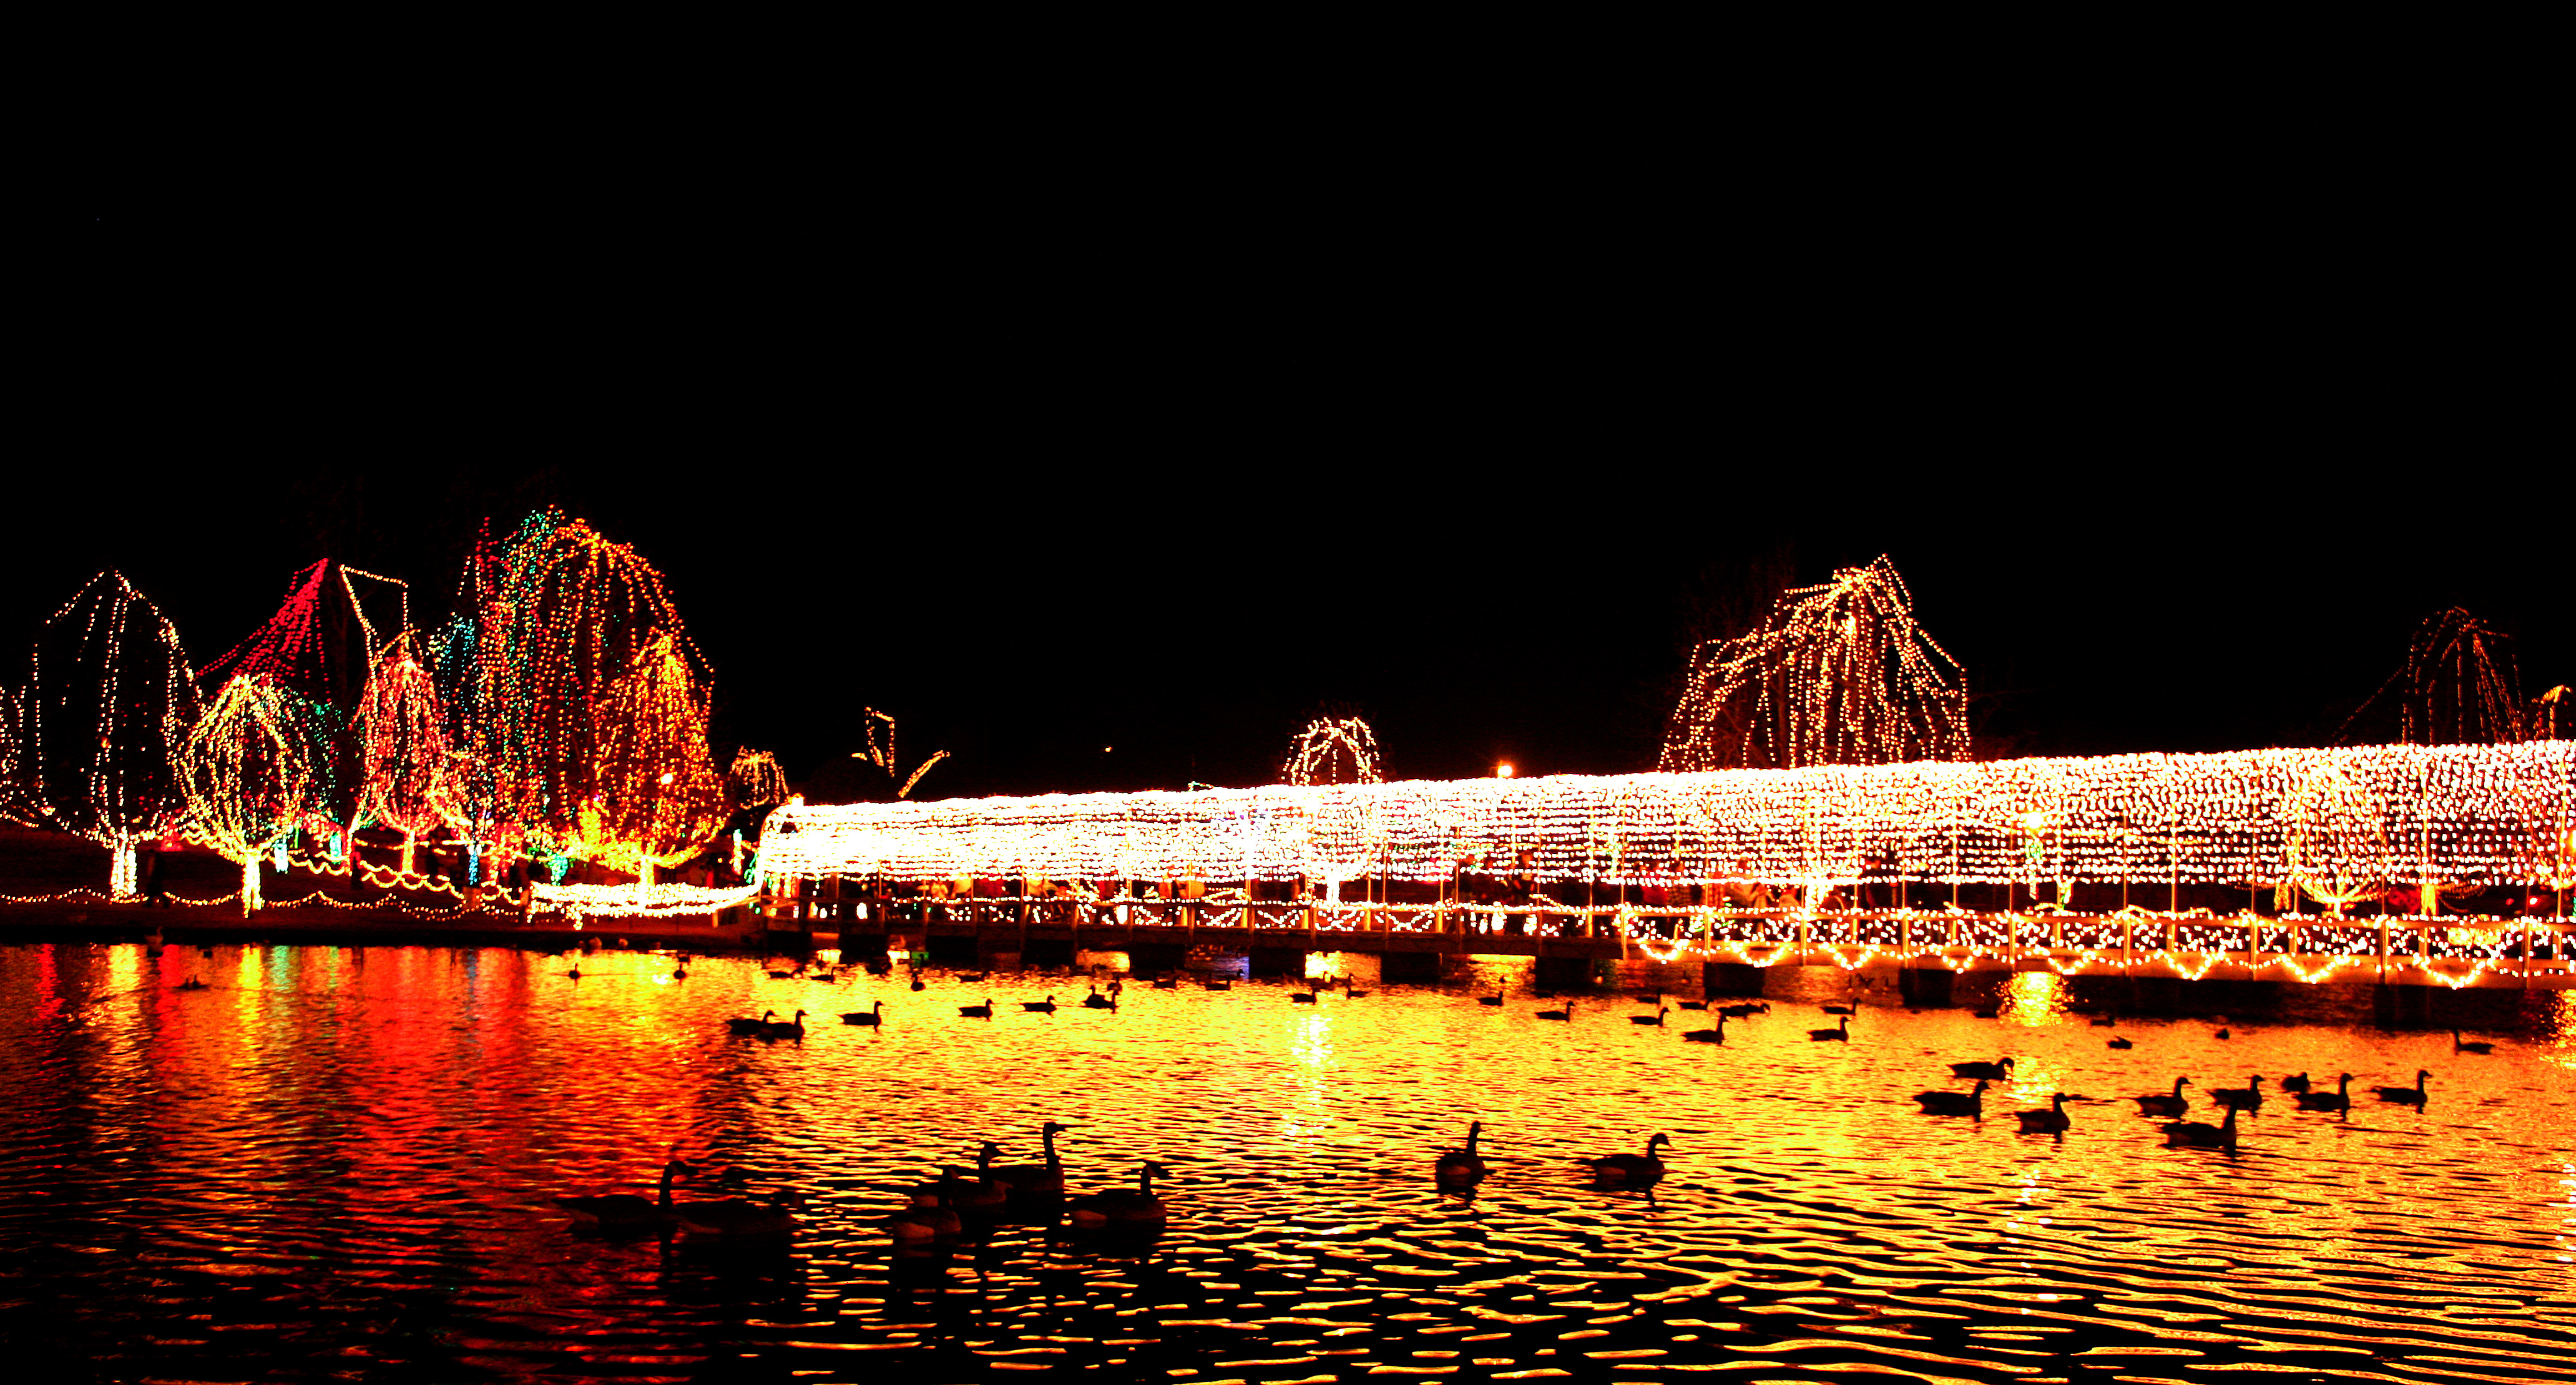 november edit festival of lights - Chickasha Christmas Lights